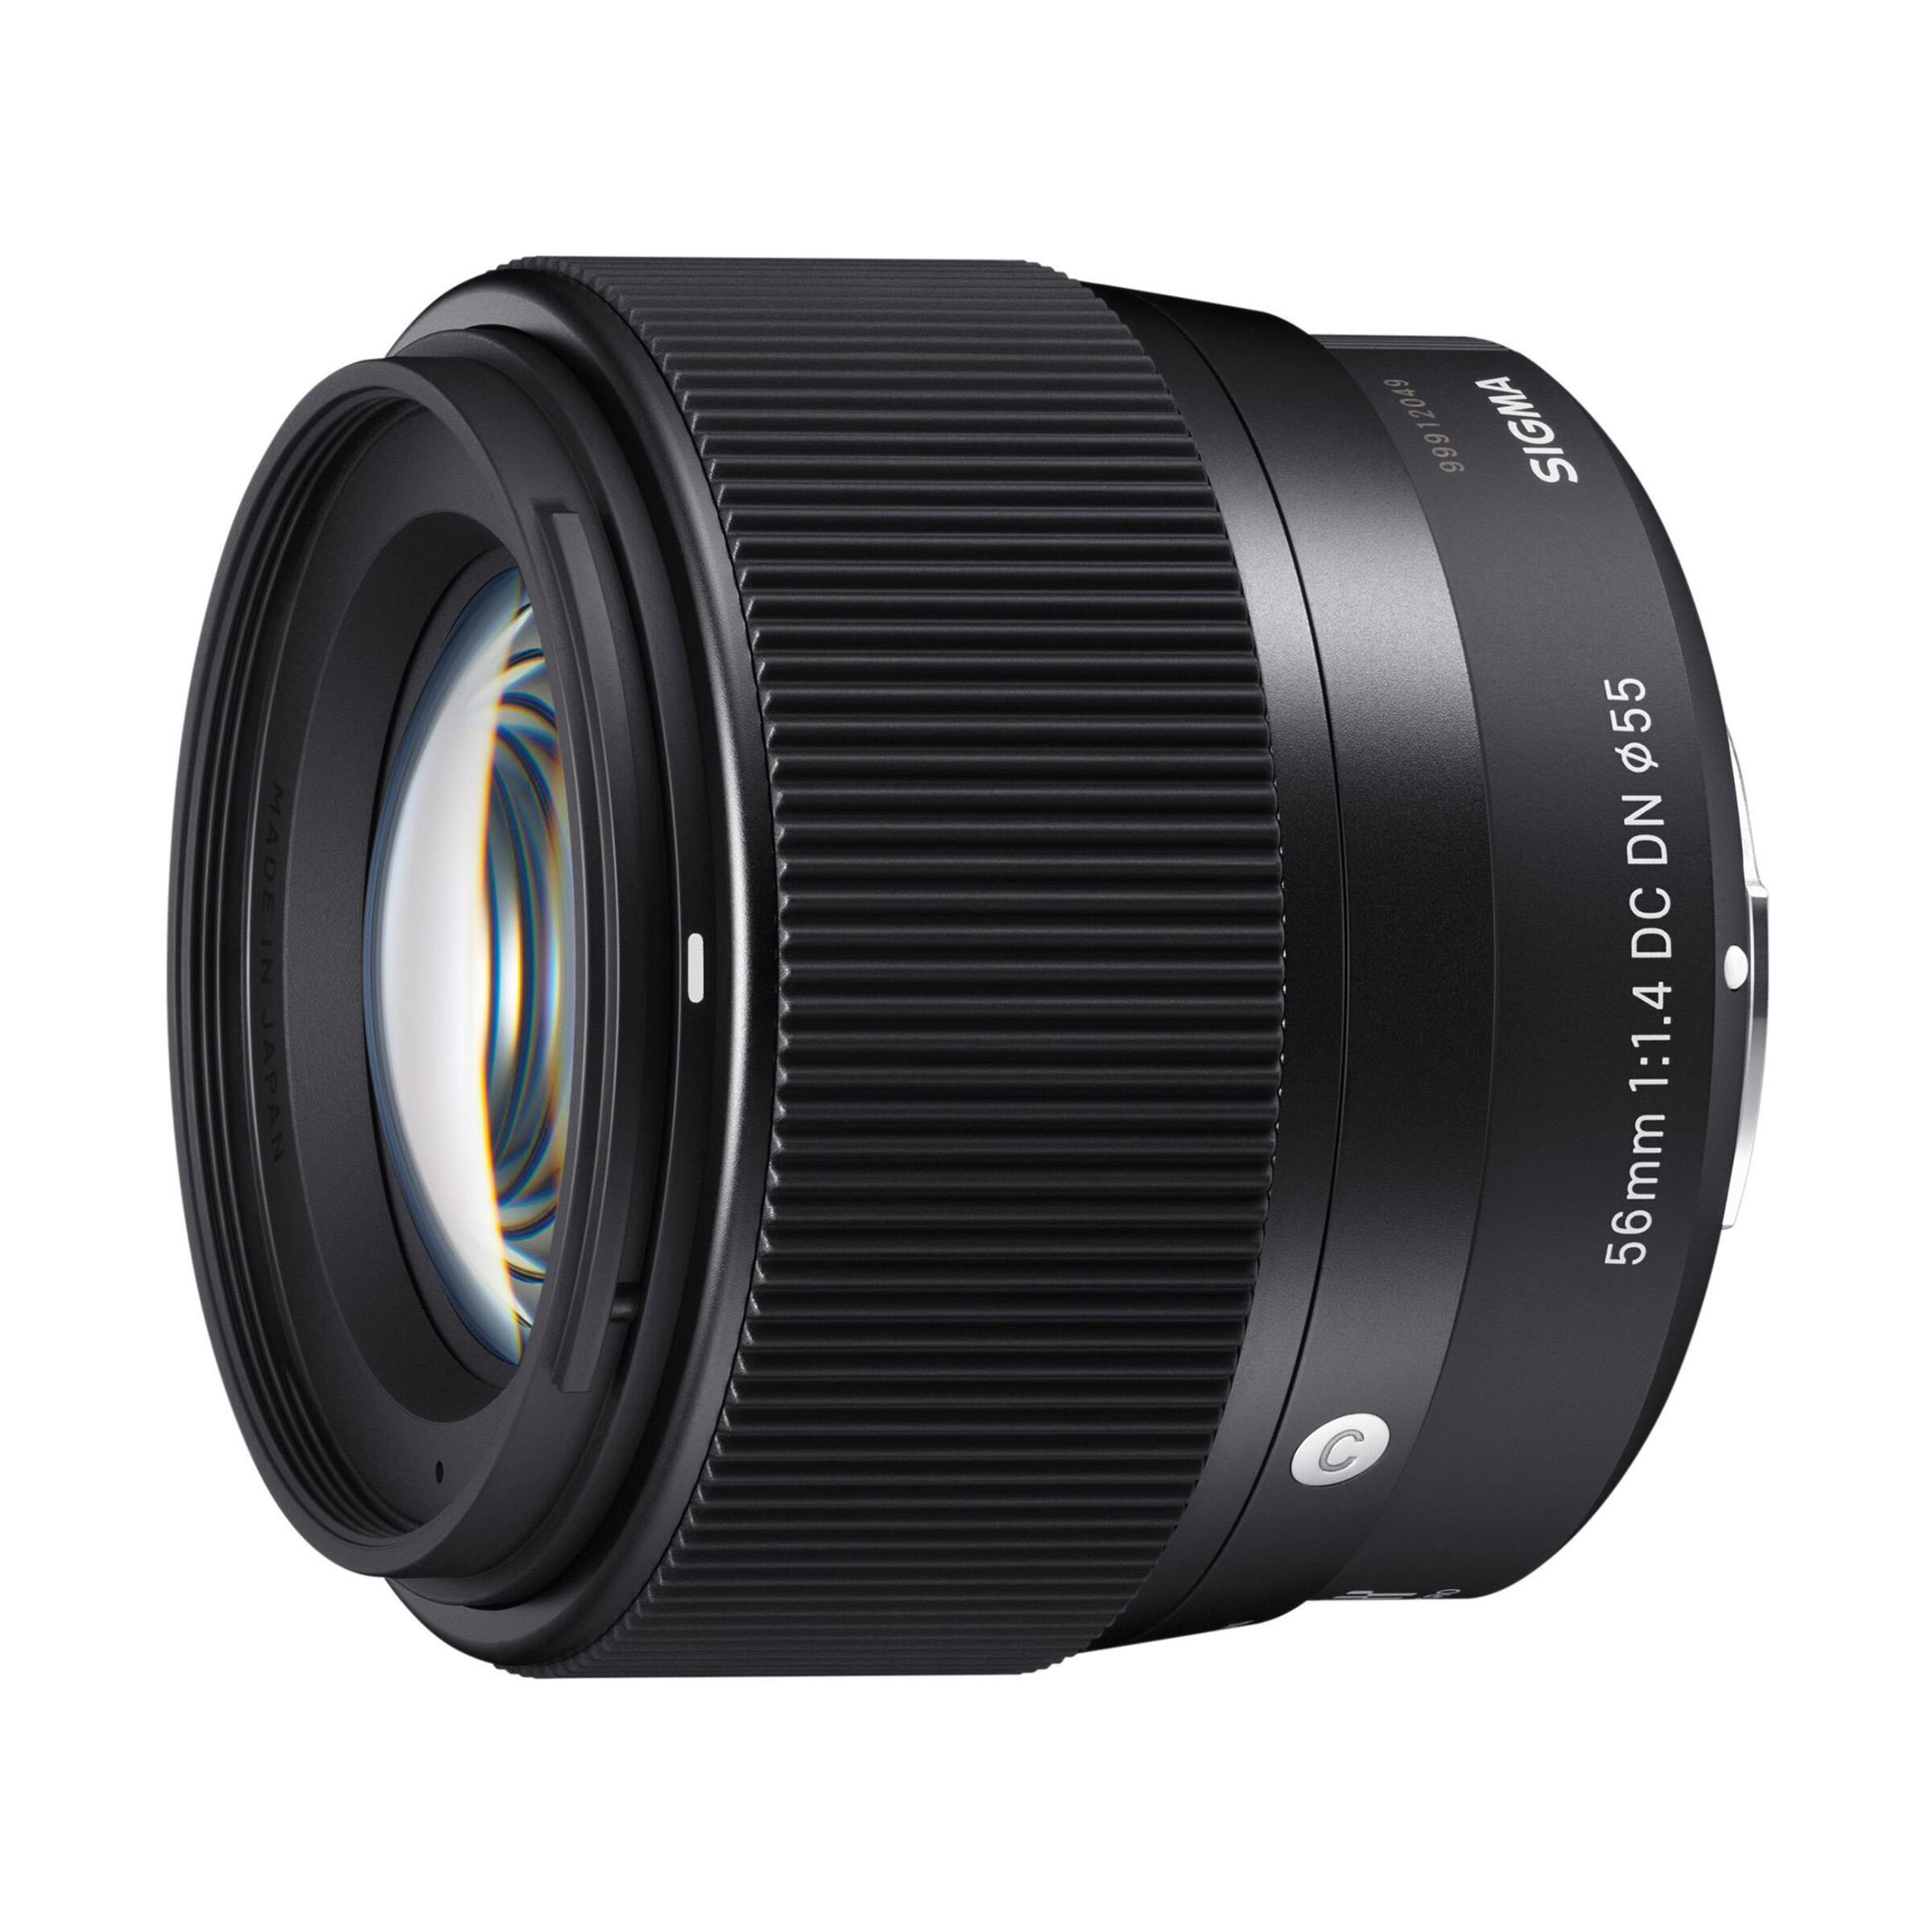 Sigma 56mm f/1,4 DC DN - Sony E